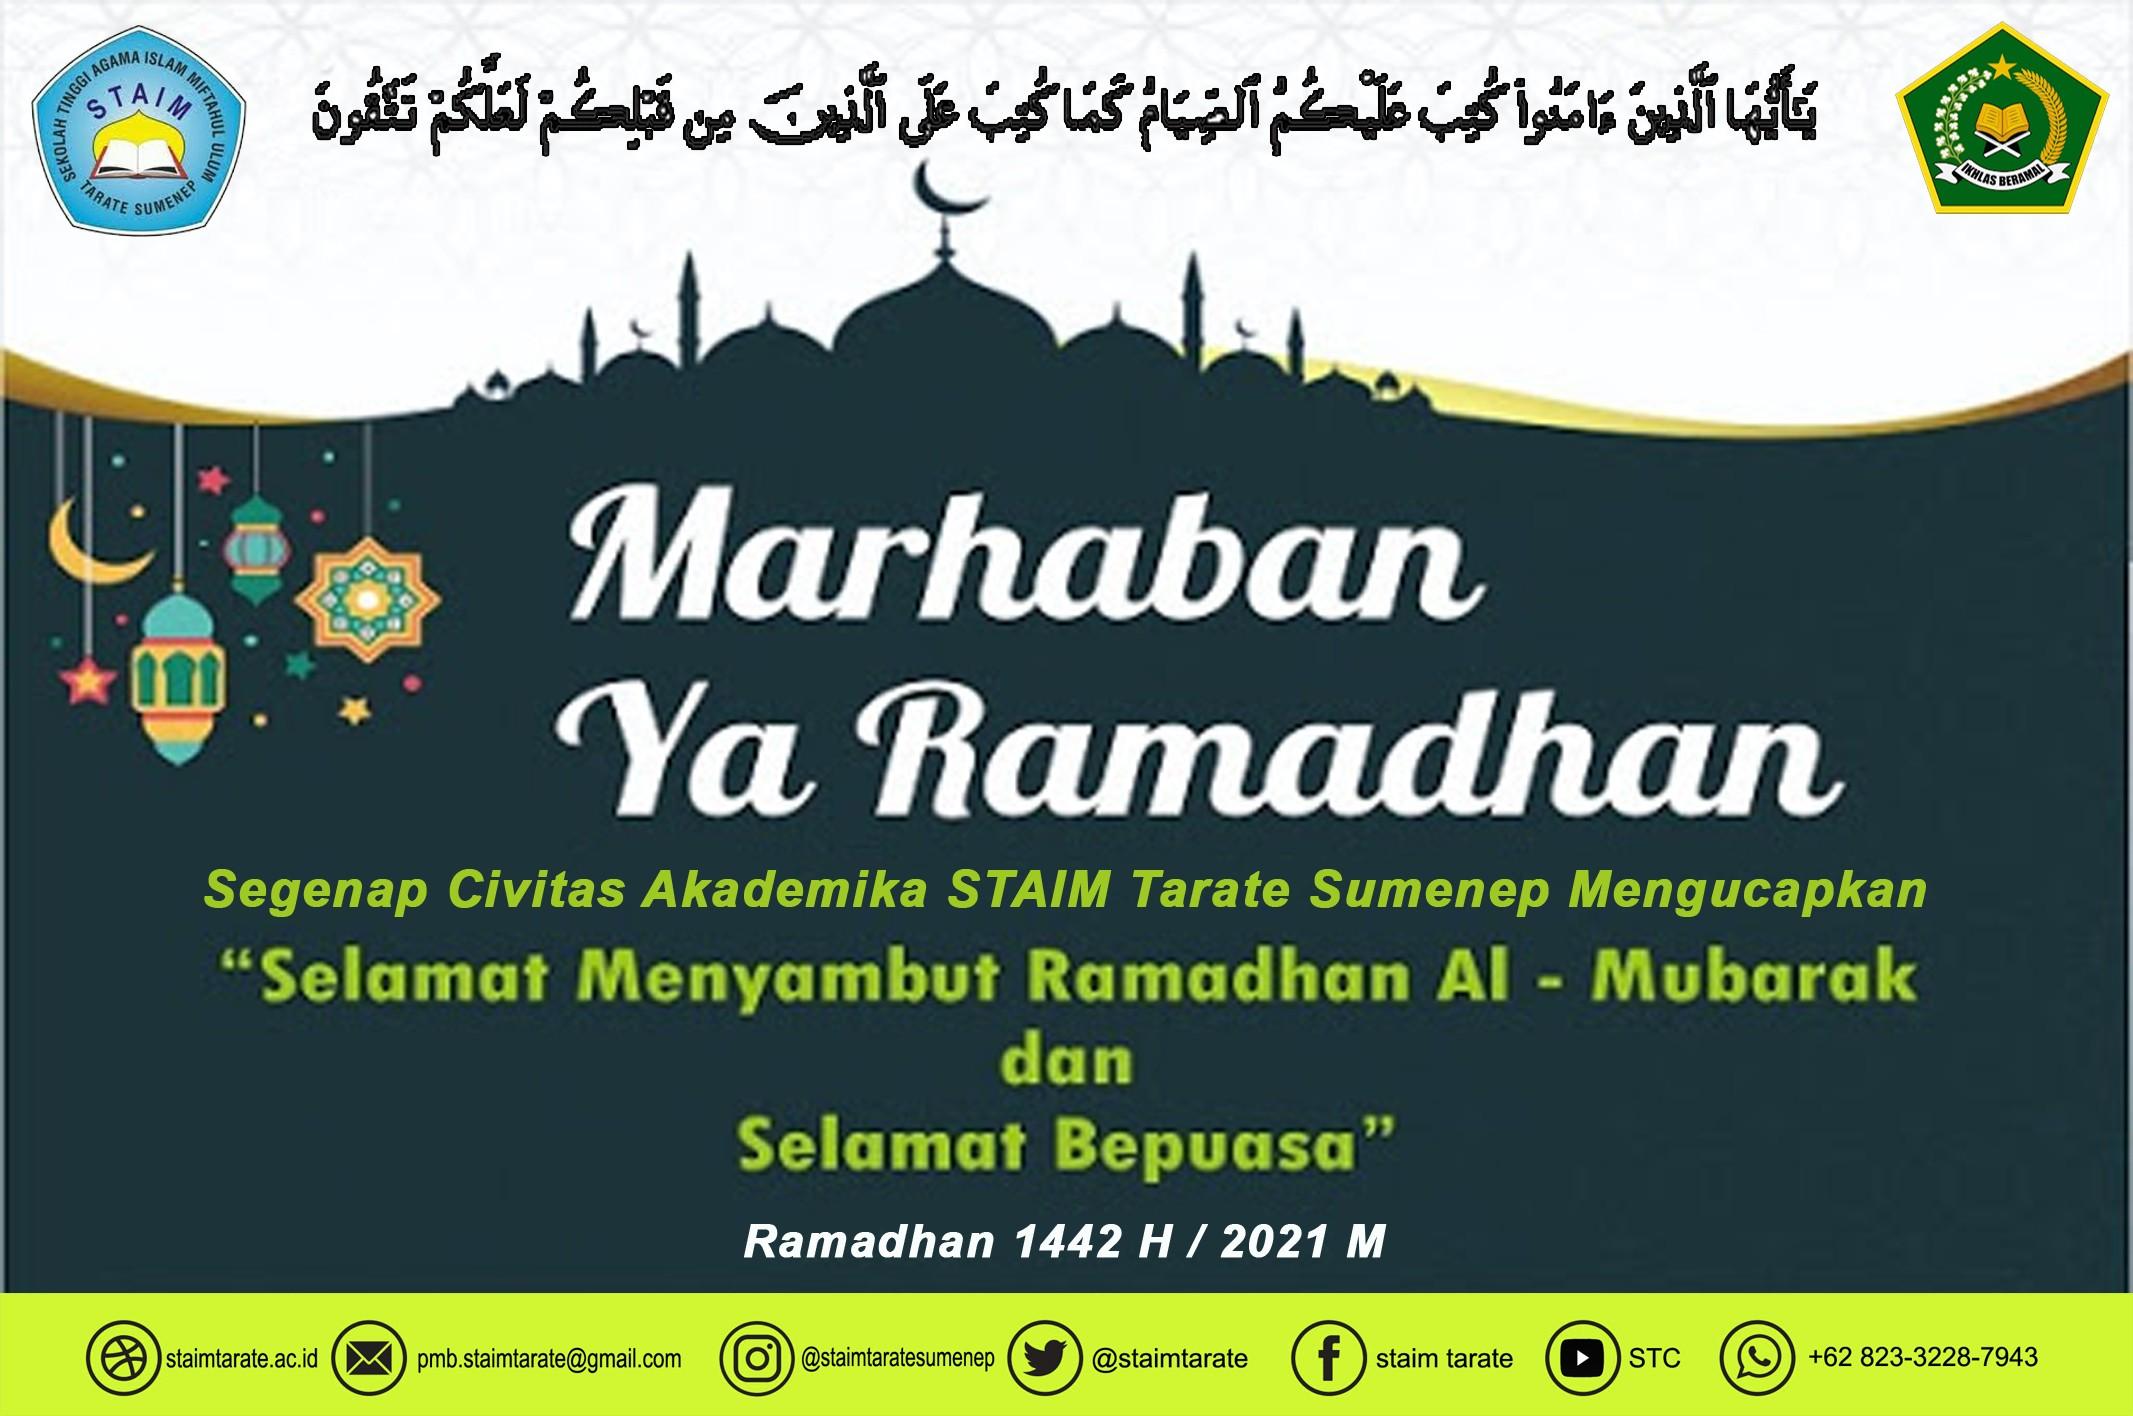 Marhaban_Ya_Ramdhan_1442_H.jpg